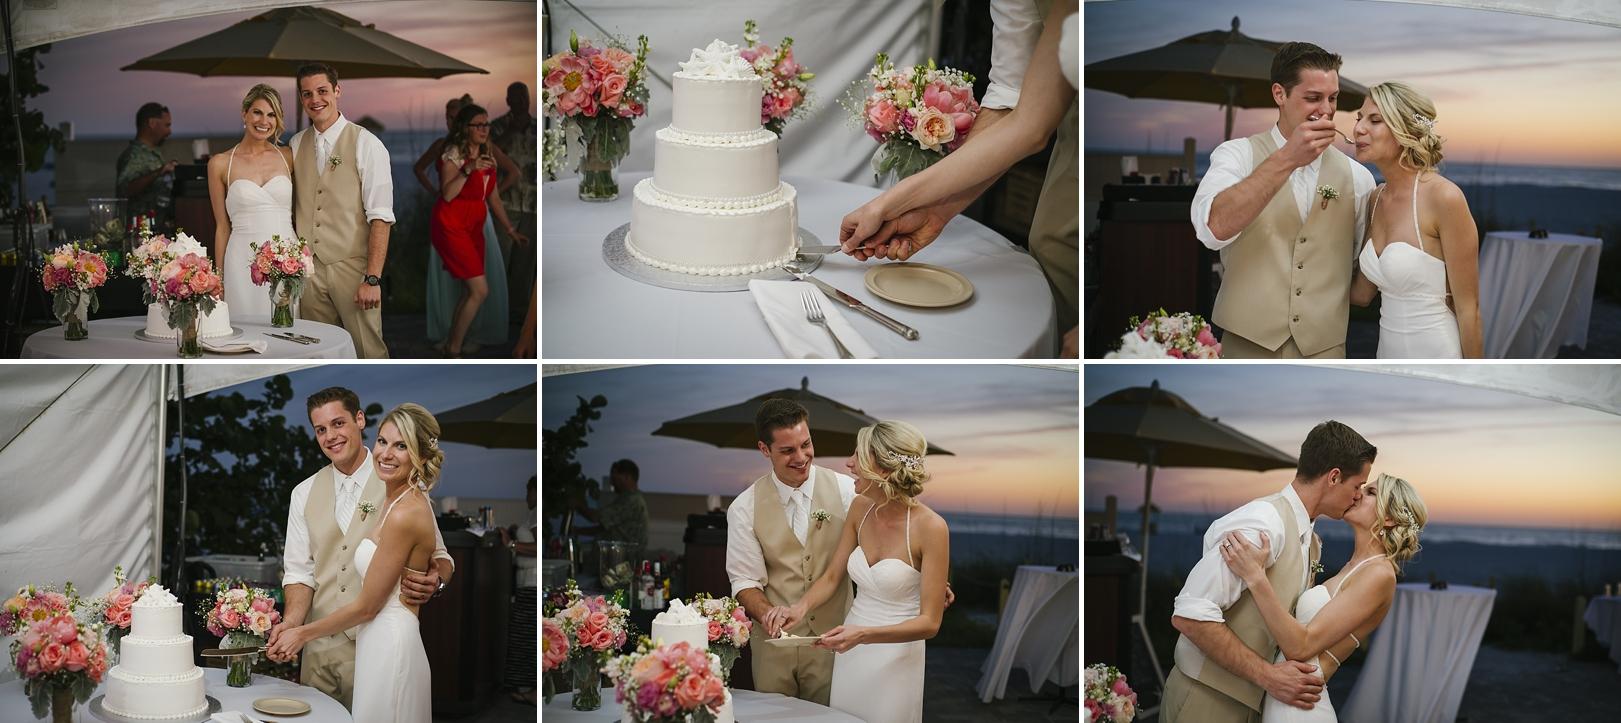 cake cutting sirata beach wedding photos